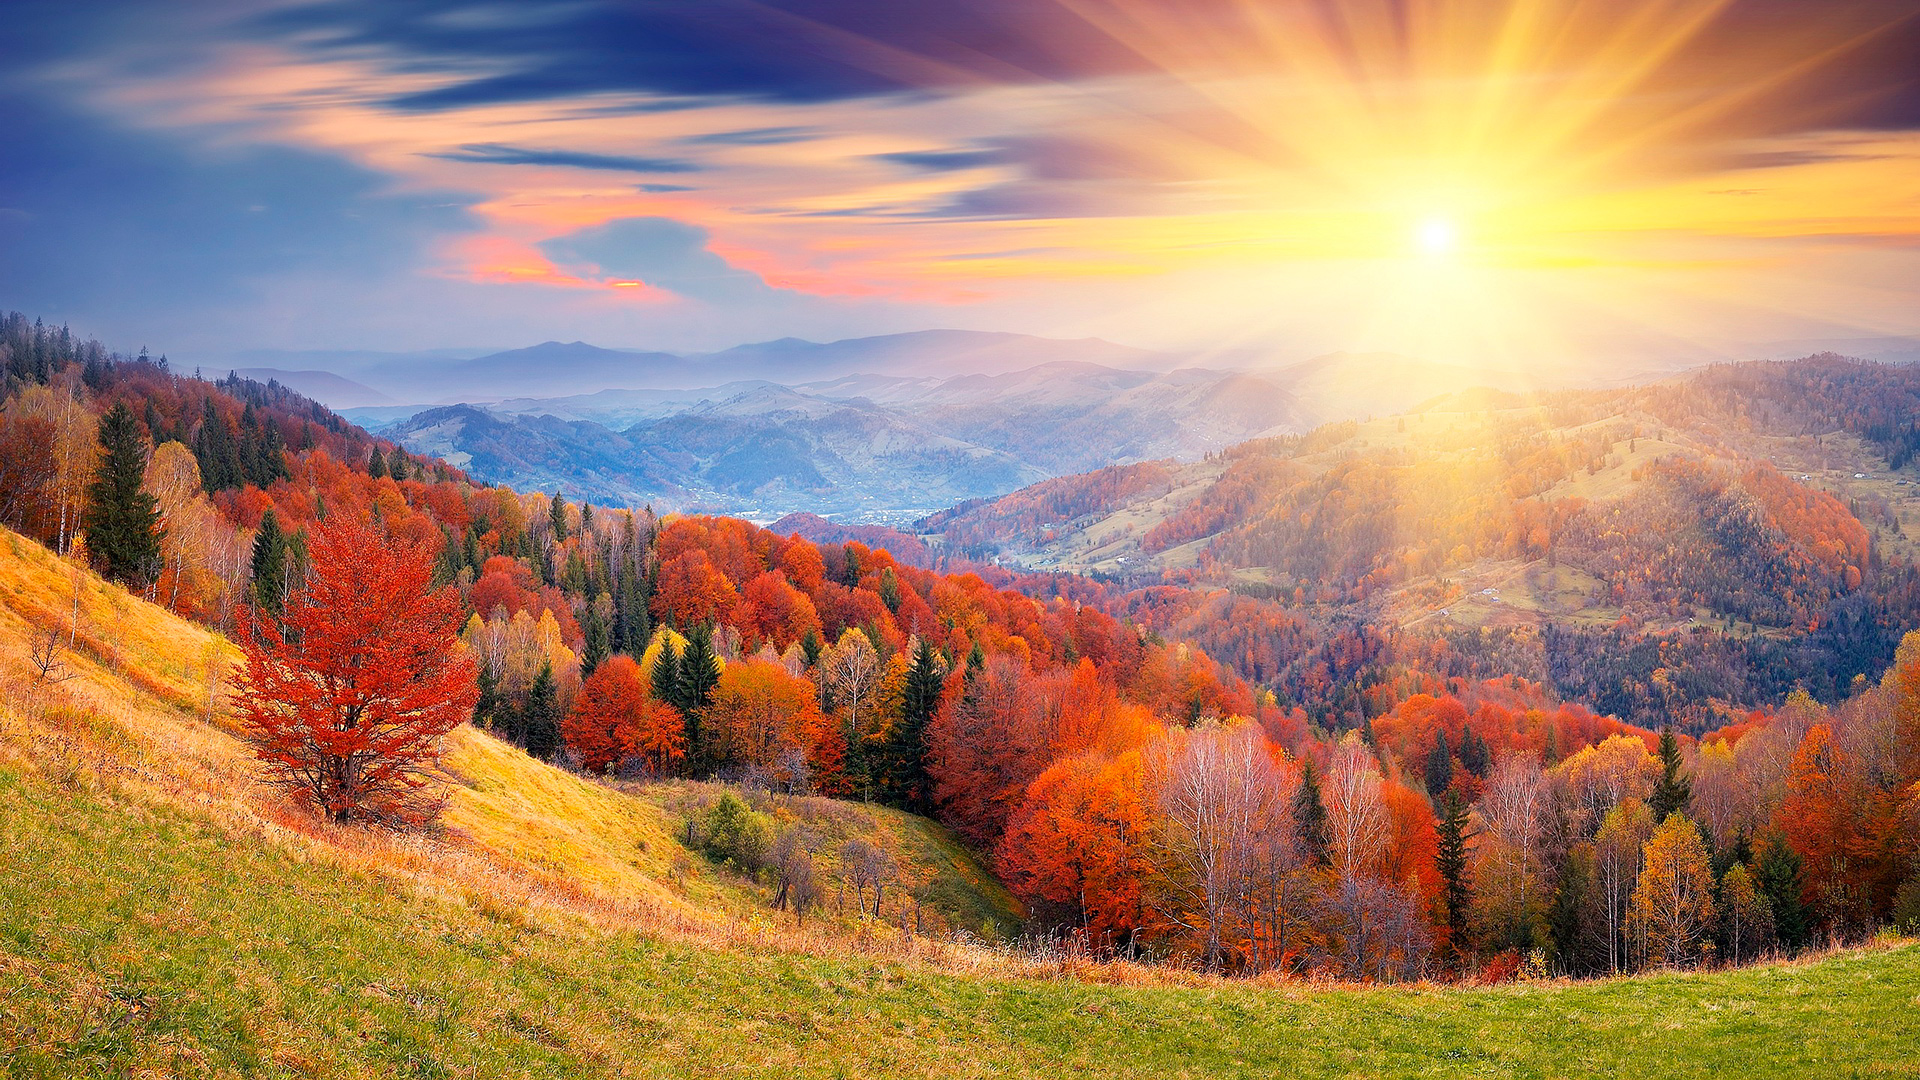 осень панорама